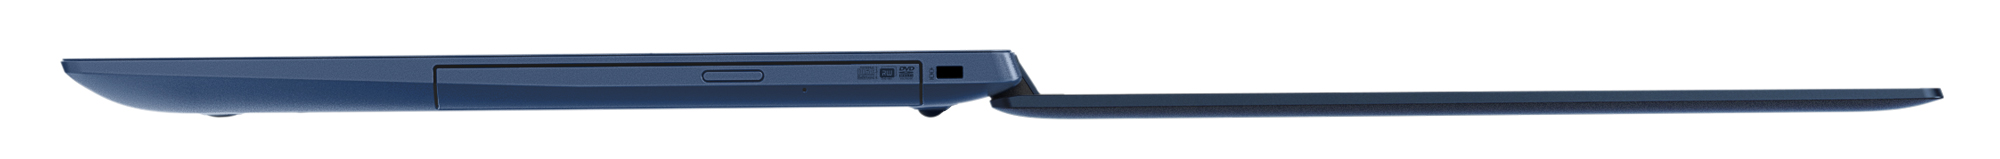 Фото  Ноутбук Lenovo ideapad 330-15 Midnight Blue (81D100M8RA)